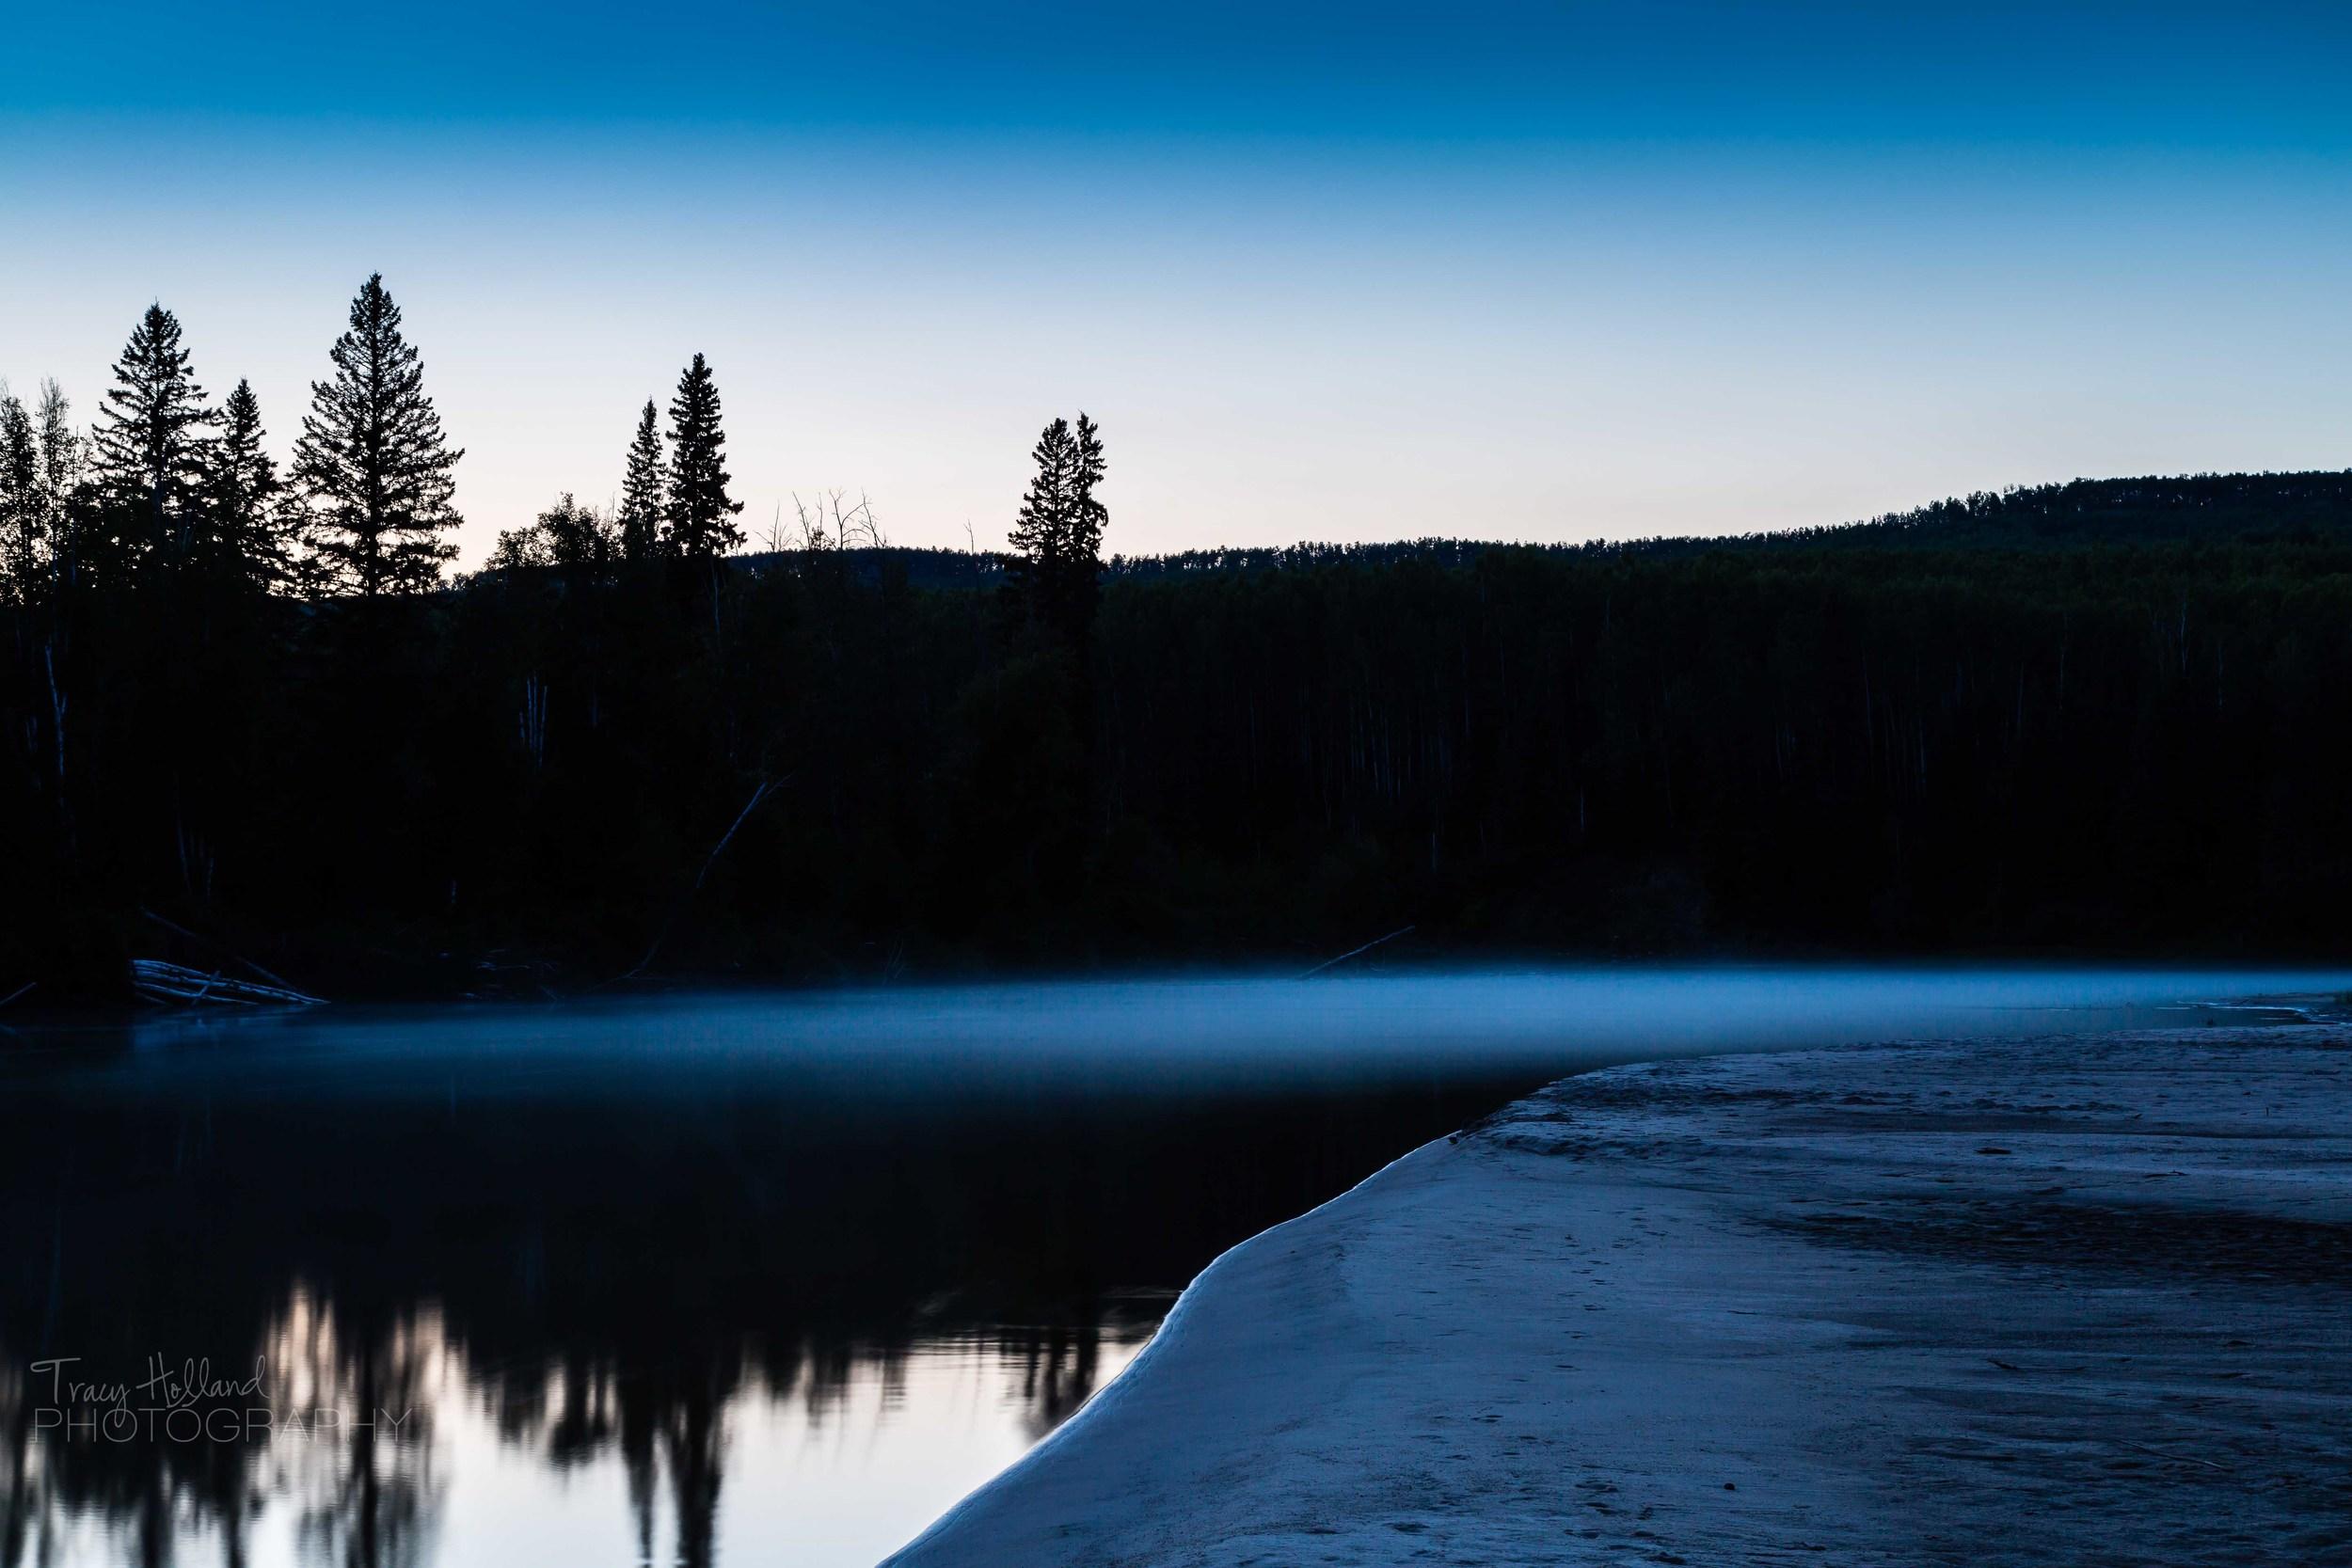 River Prt 082214-9351.jpg